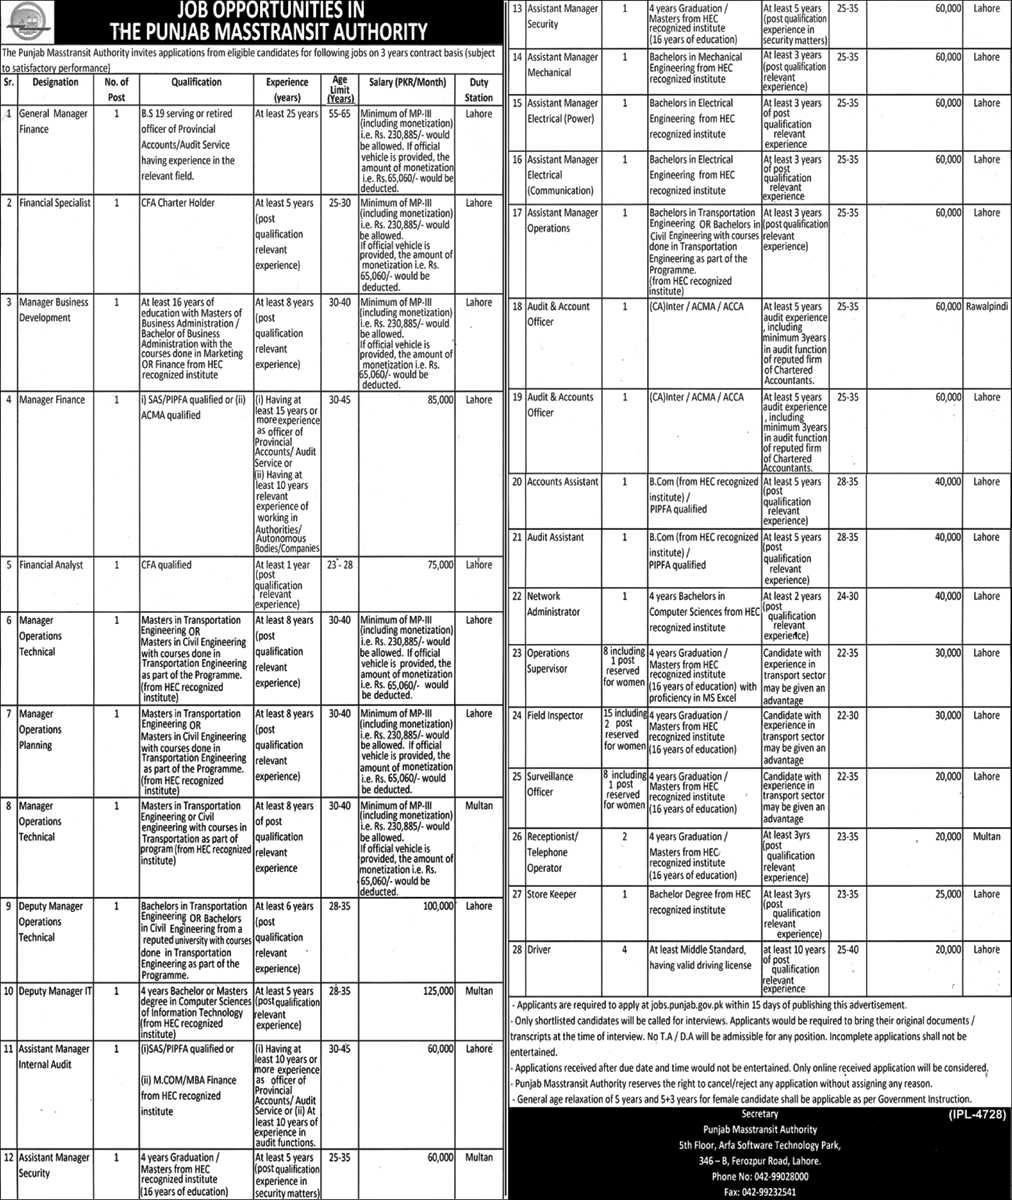 Punjab Masstransit Authority (PMA) Jobs 2021 in Pakistan - Metro Bus Jobs in Lahore 2021